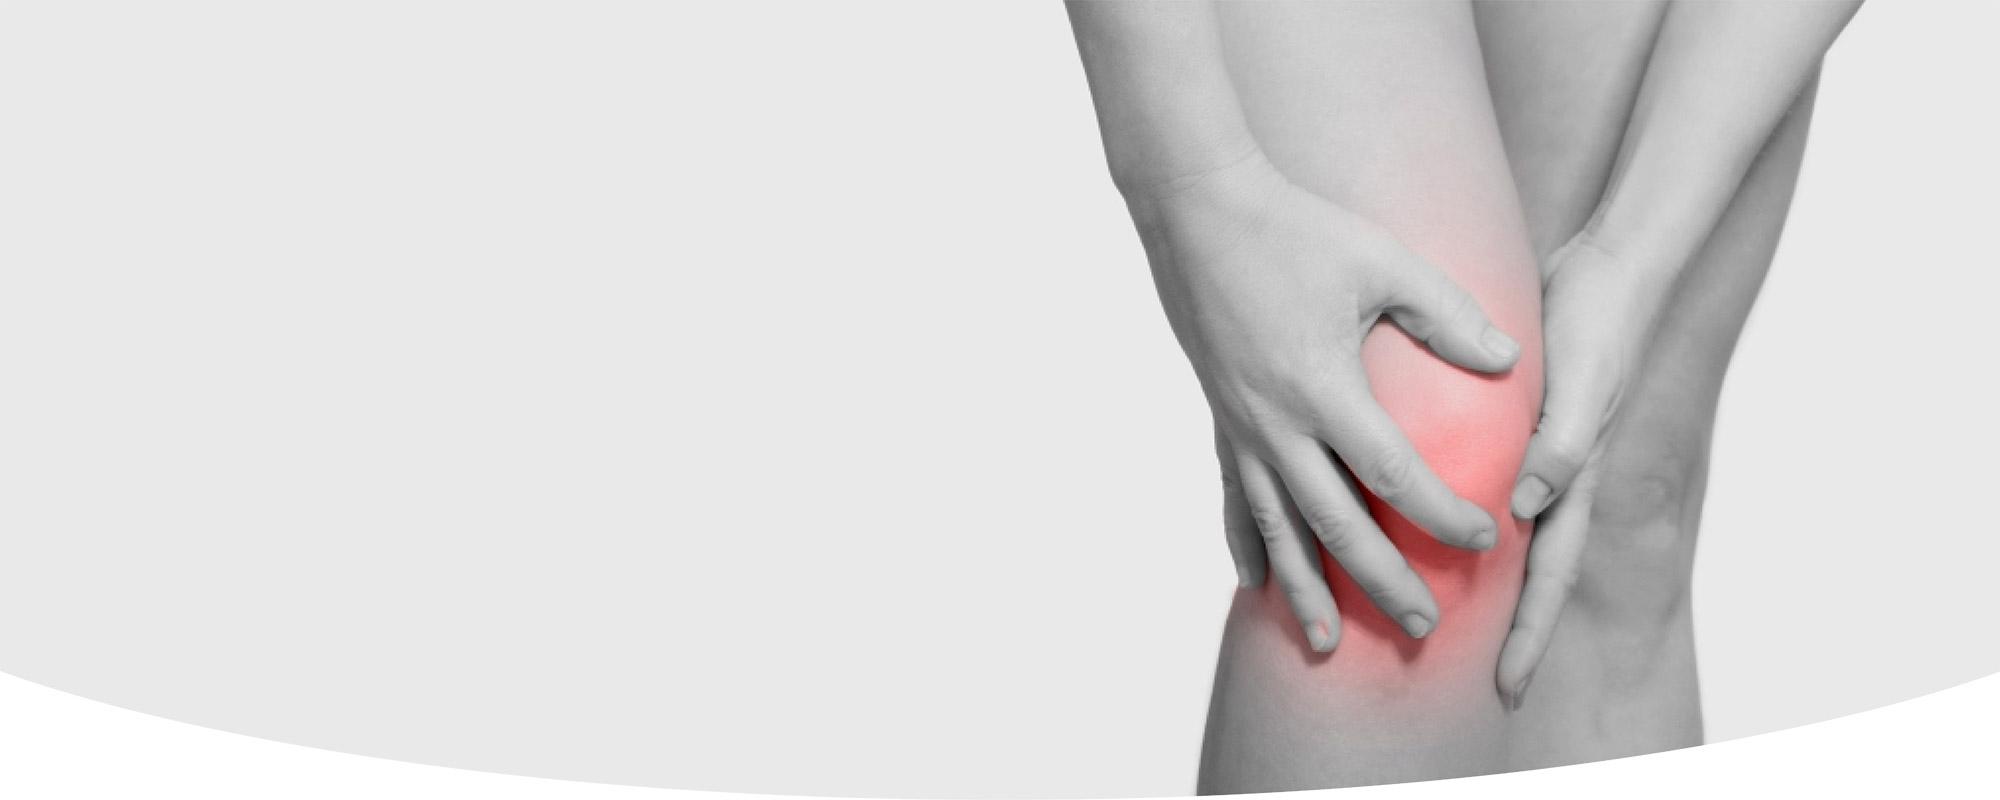 38++ Arthritis osteoporosis center reading pa viral